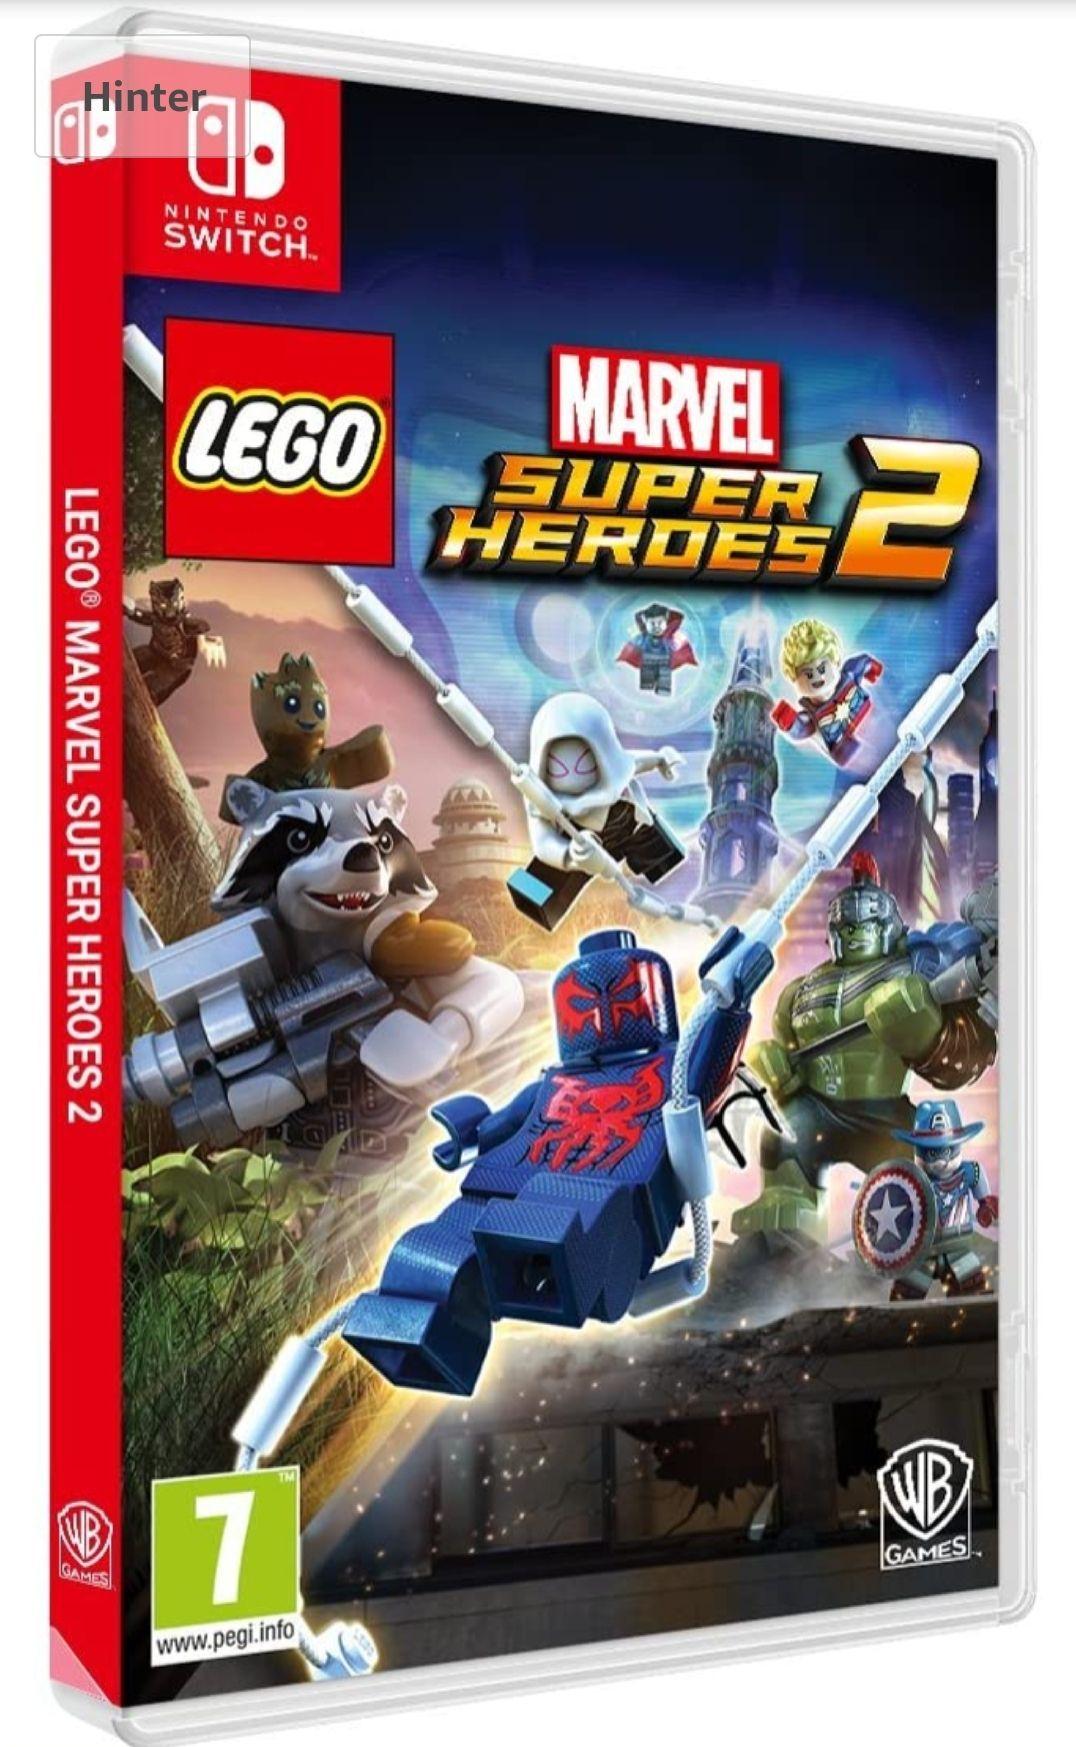 Lego Marvel Superhelden 2 - Amazon Exclusive Edition - Nintendo Switch